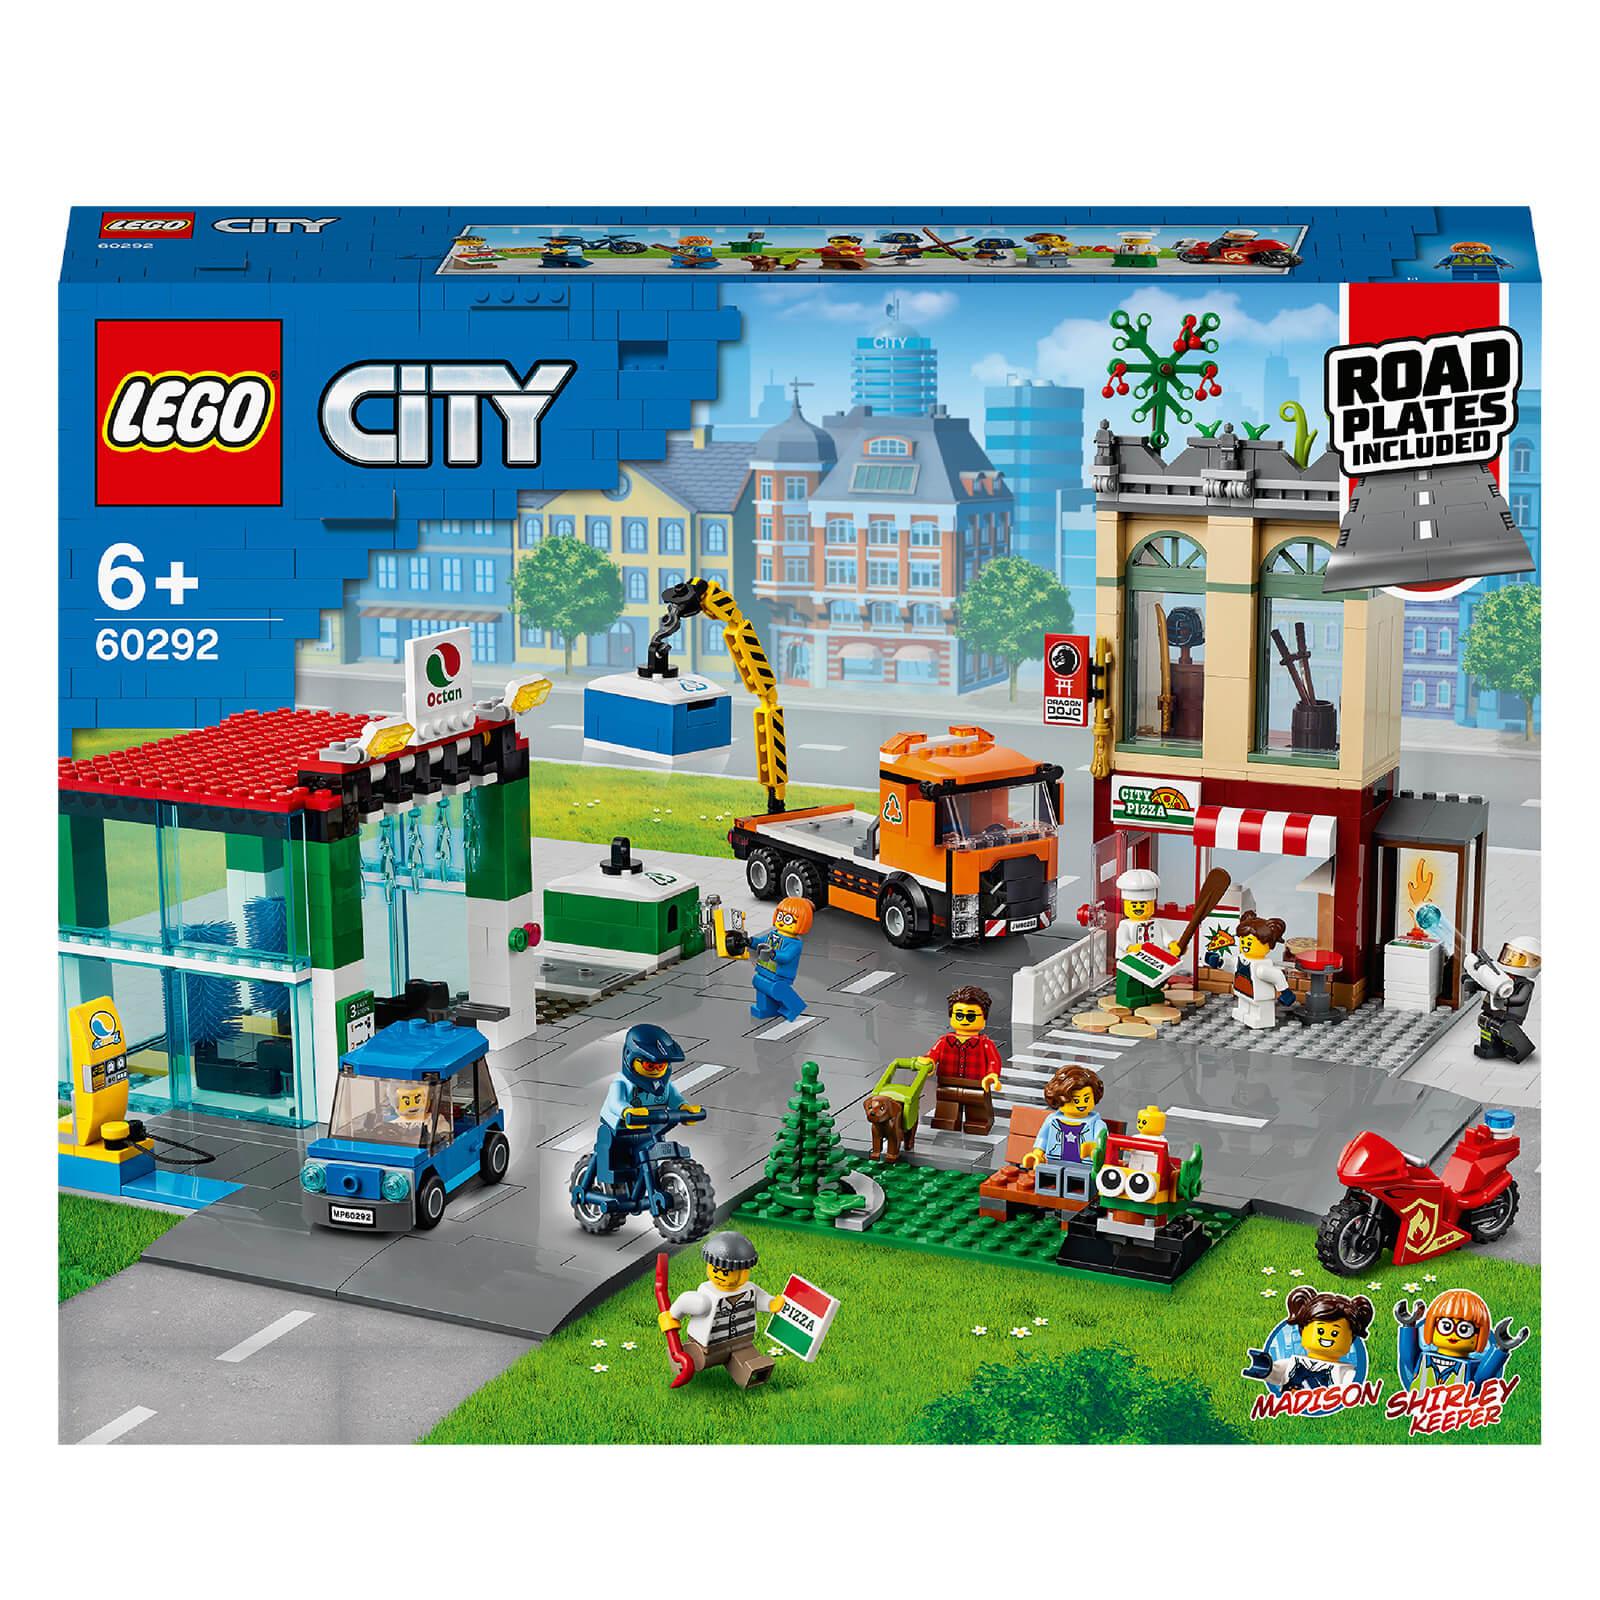 Image of Lego City Town Center Construction Set